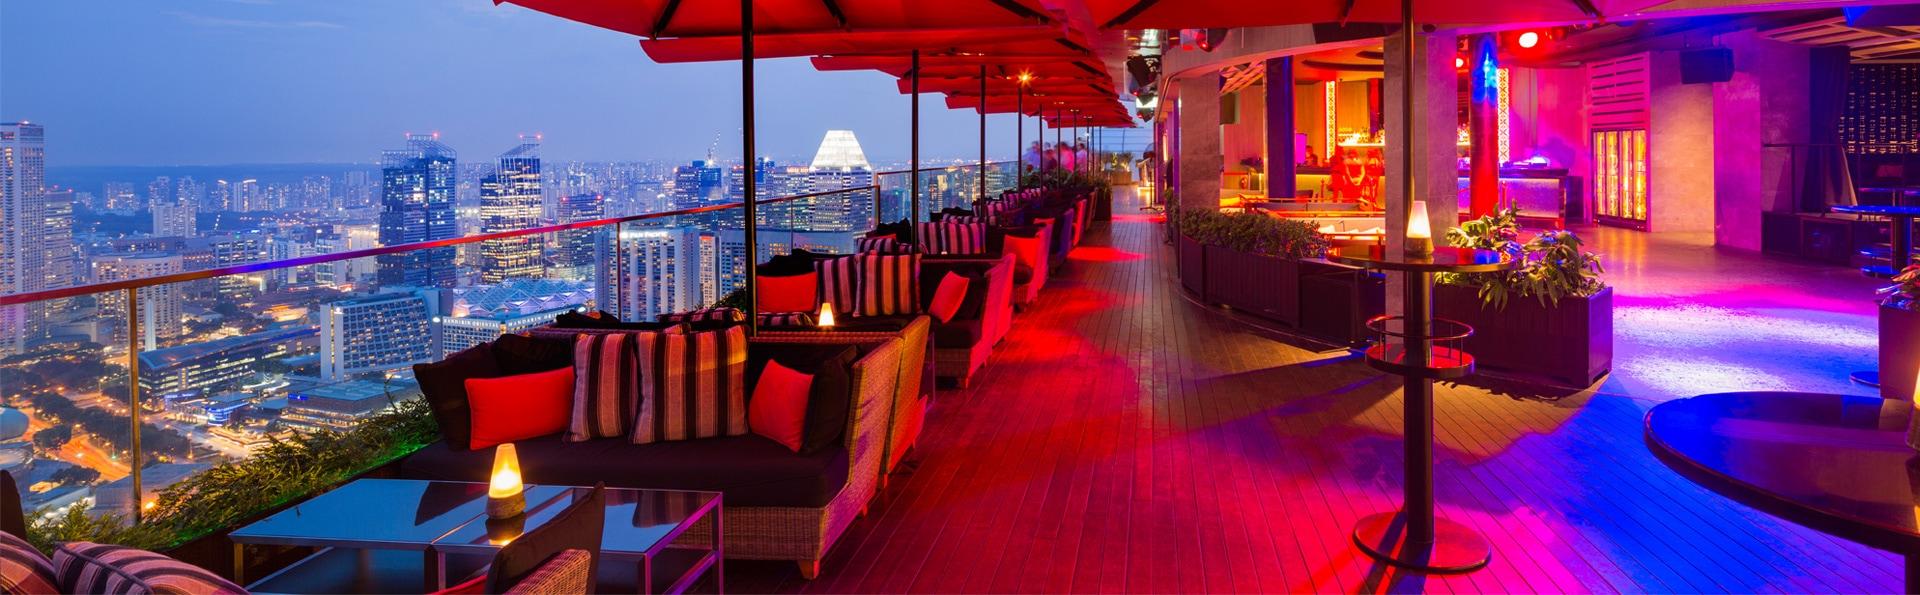 Marina Bay Sands Restaurants Top Floor Carpet Vidalondon